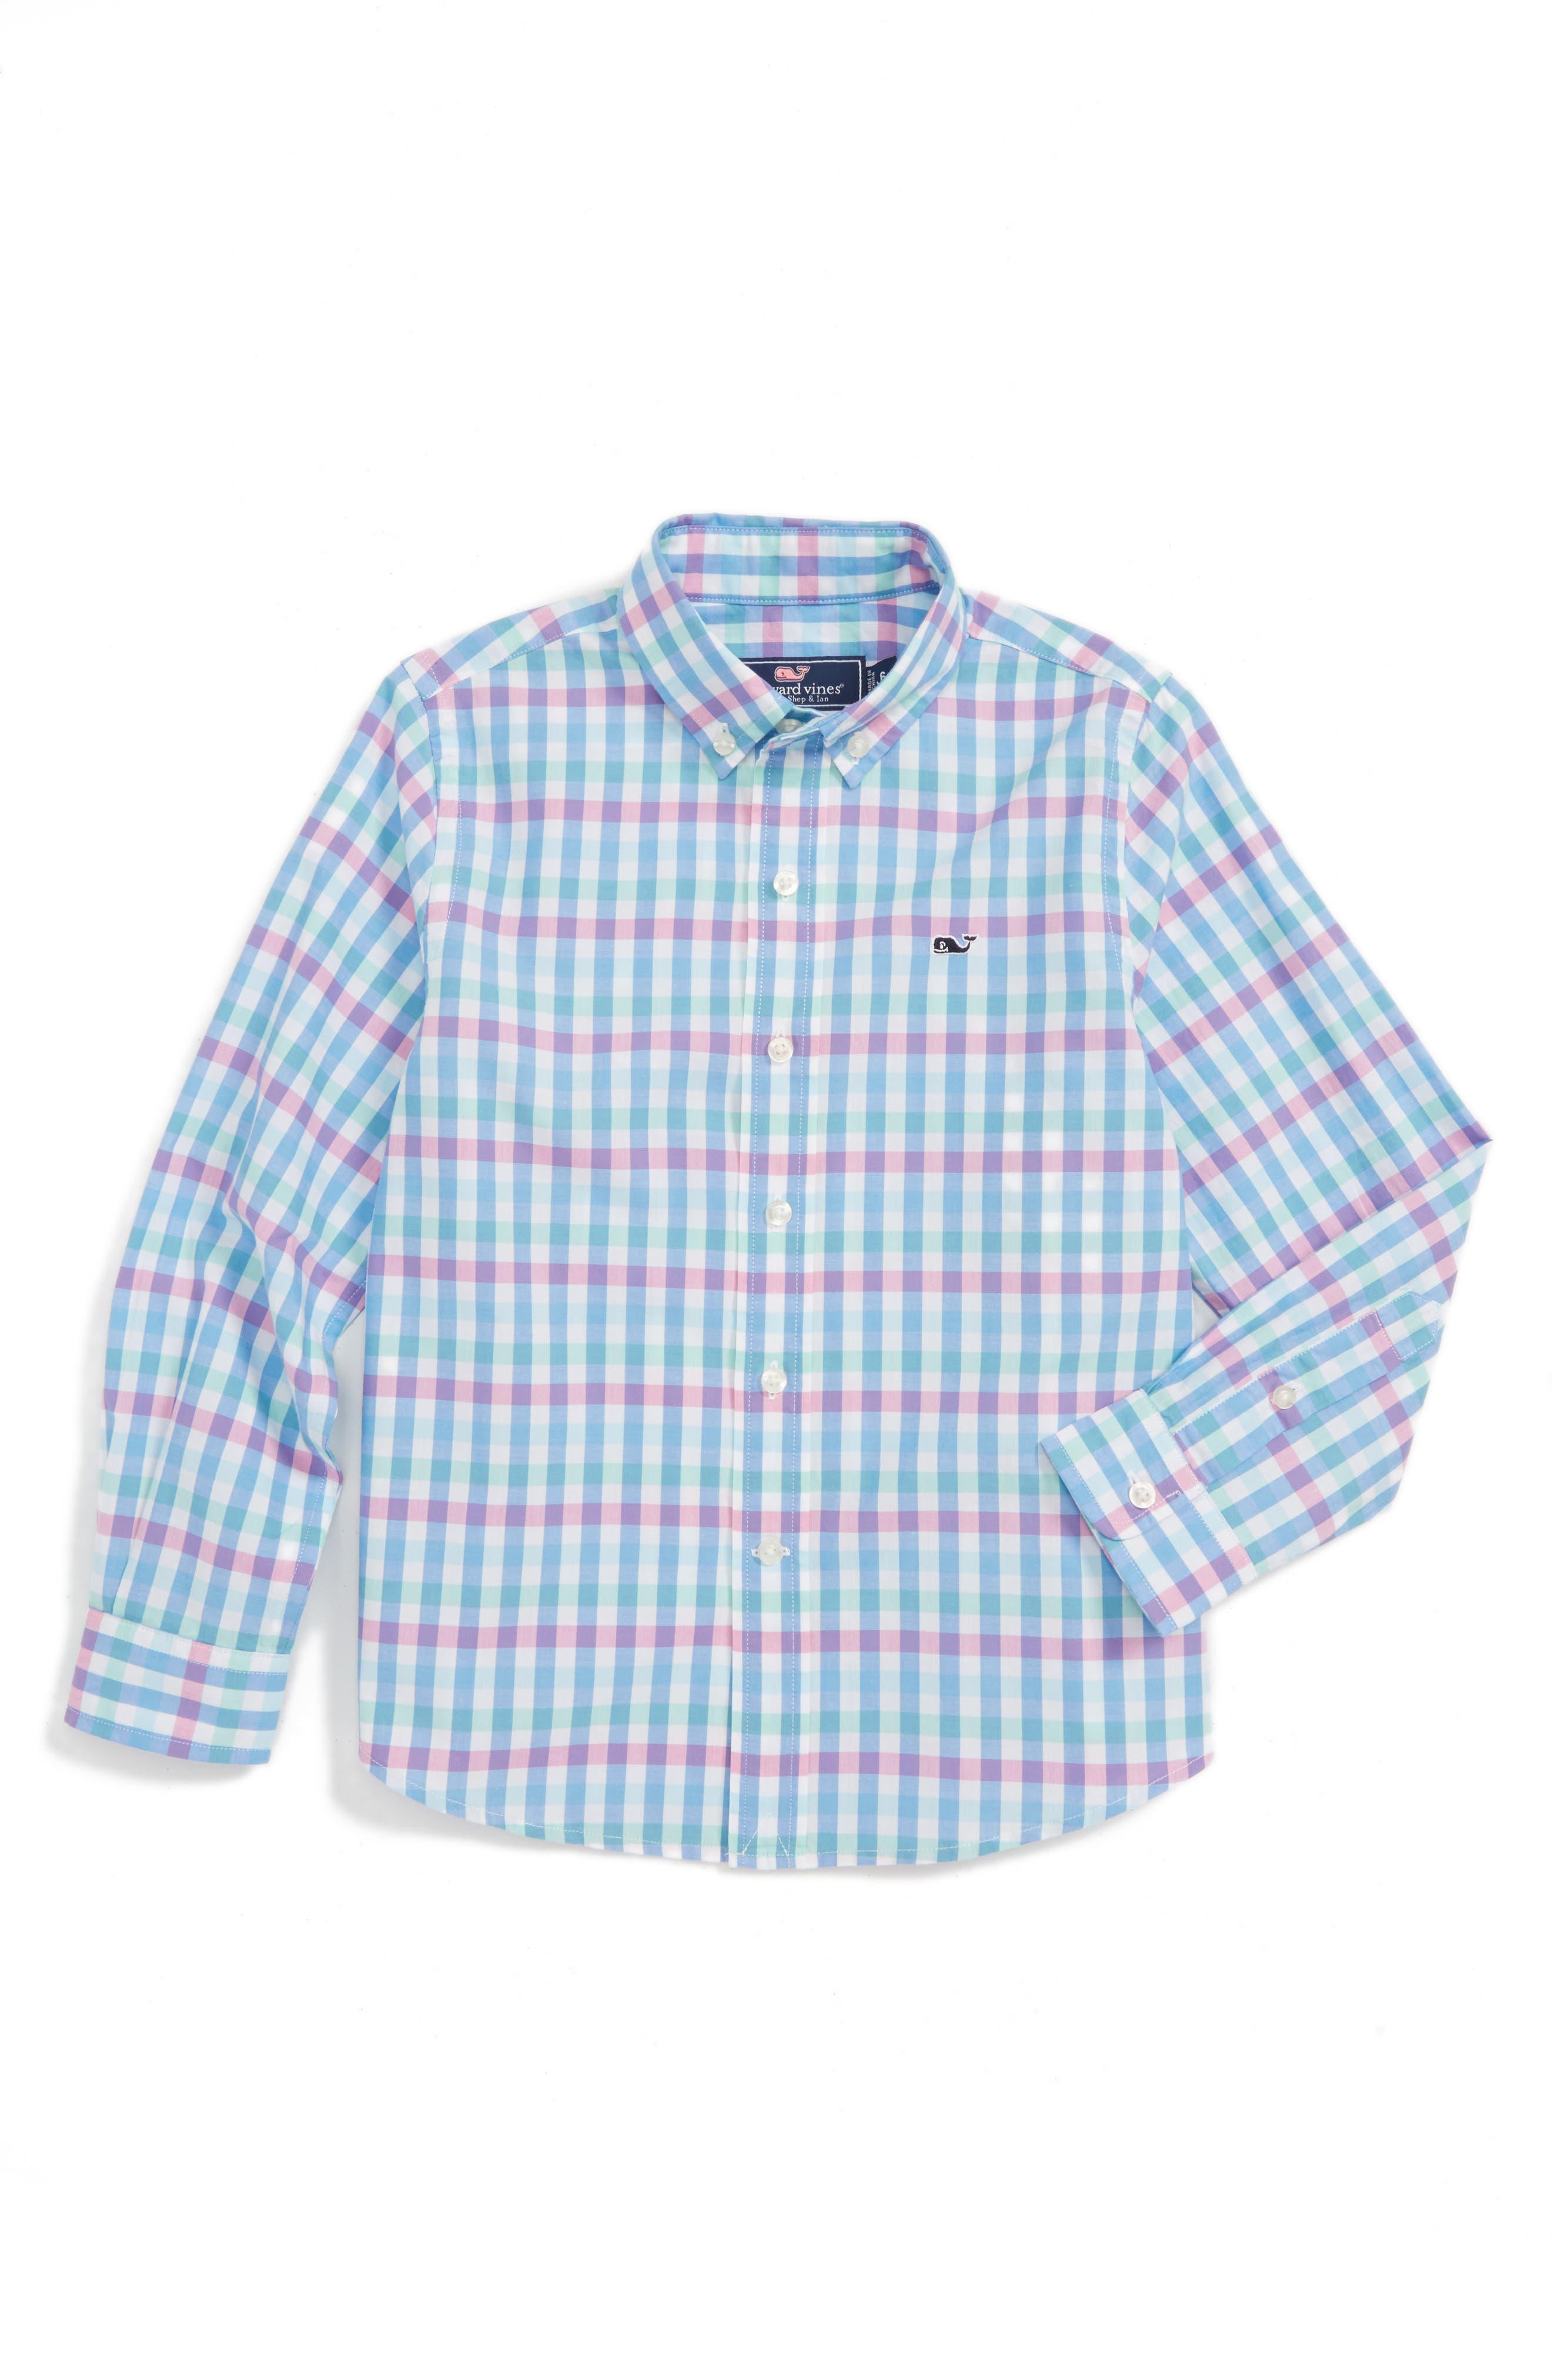 Vineyard Vines Crystal Reef Check Whale Shirt (Toddler Boys & Little Boys)